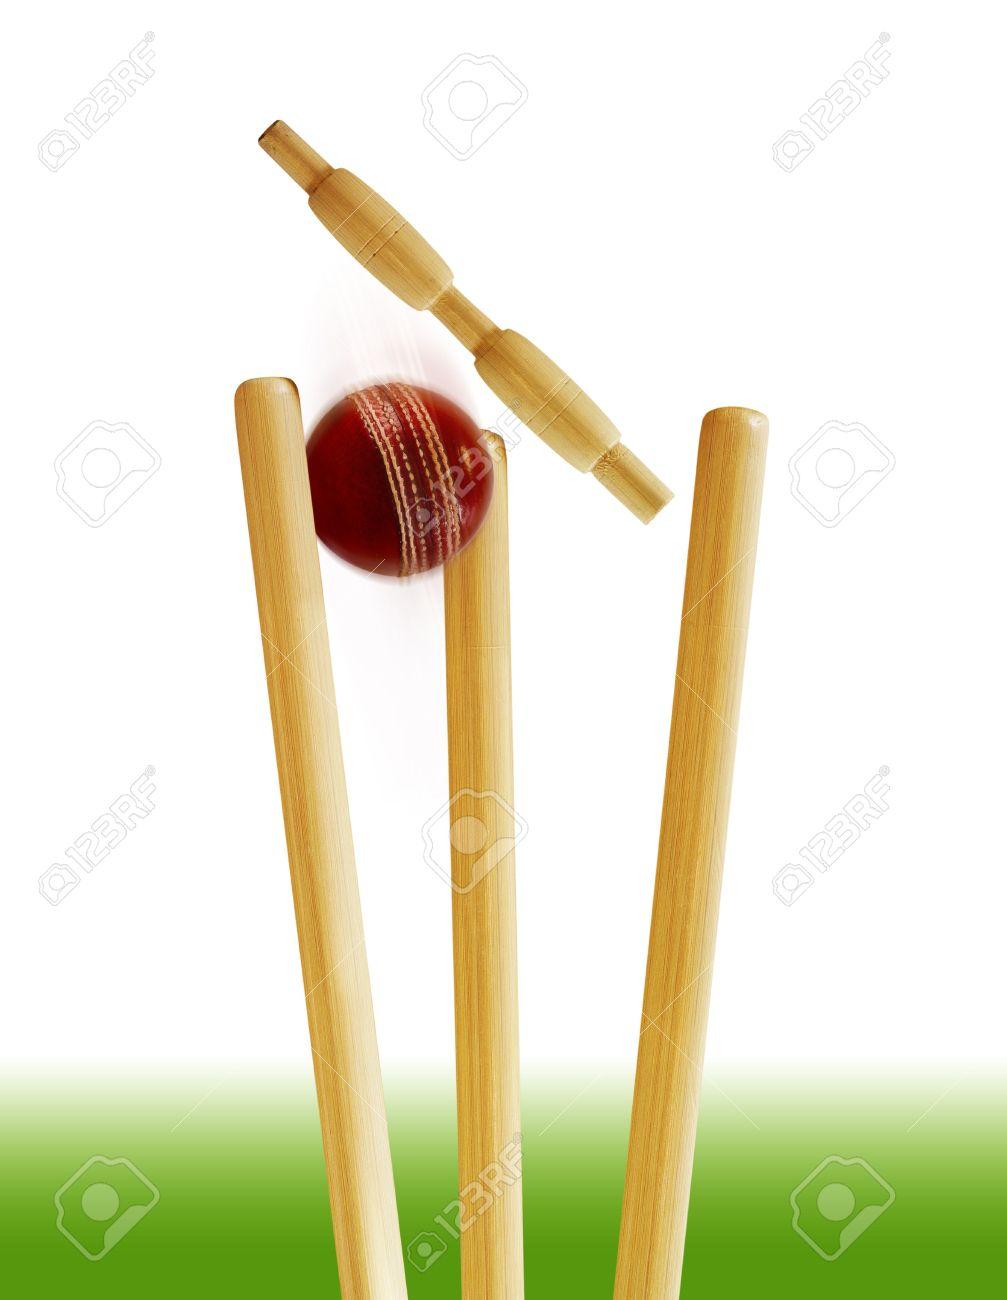 Cricket Stumps Clipart Png.